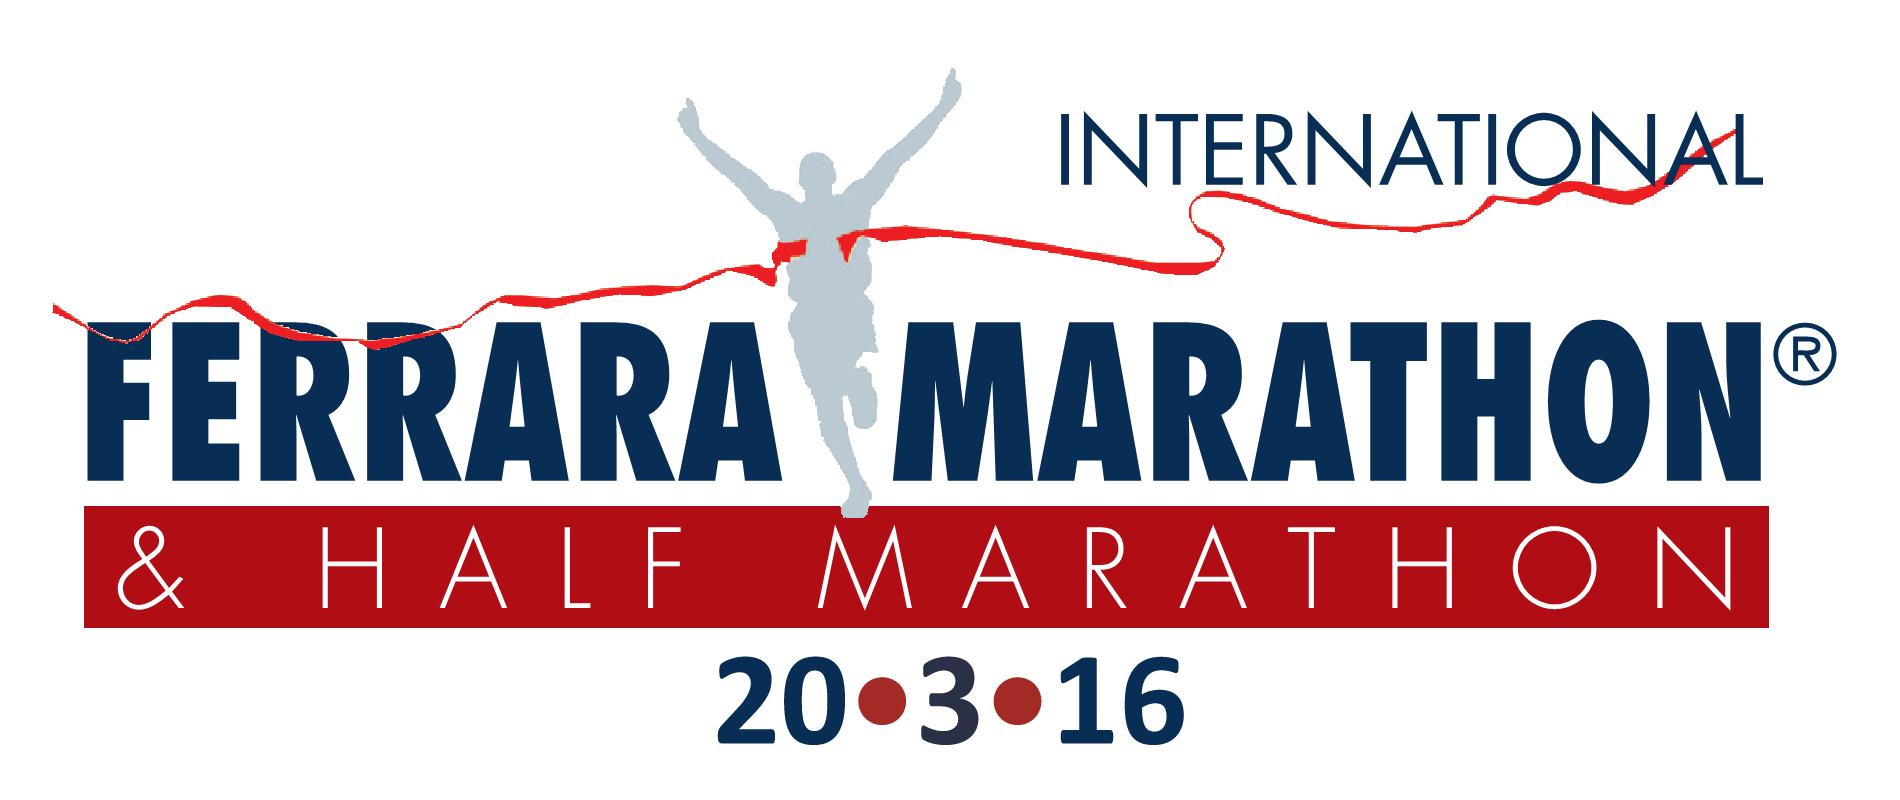 CLASSIFICHE MARATONA & MEZZA MARATONA 2016